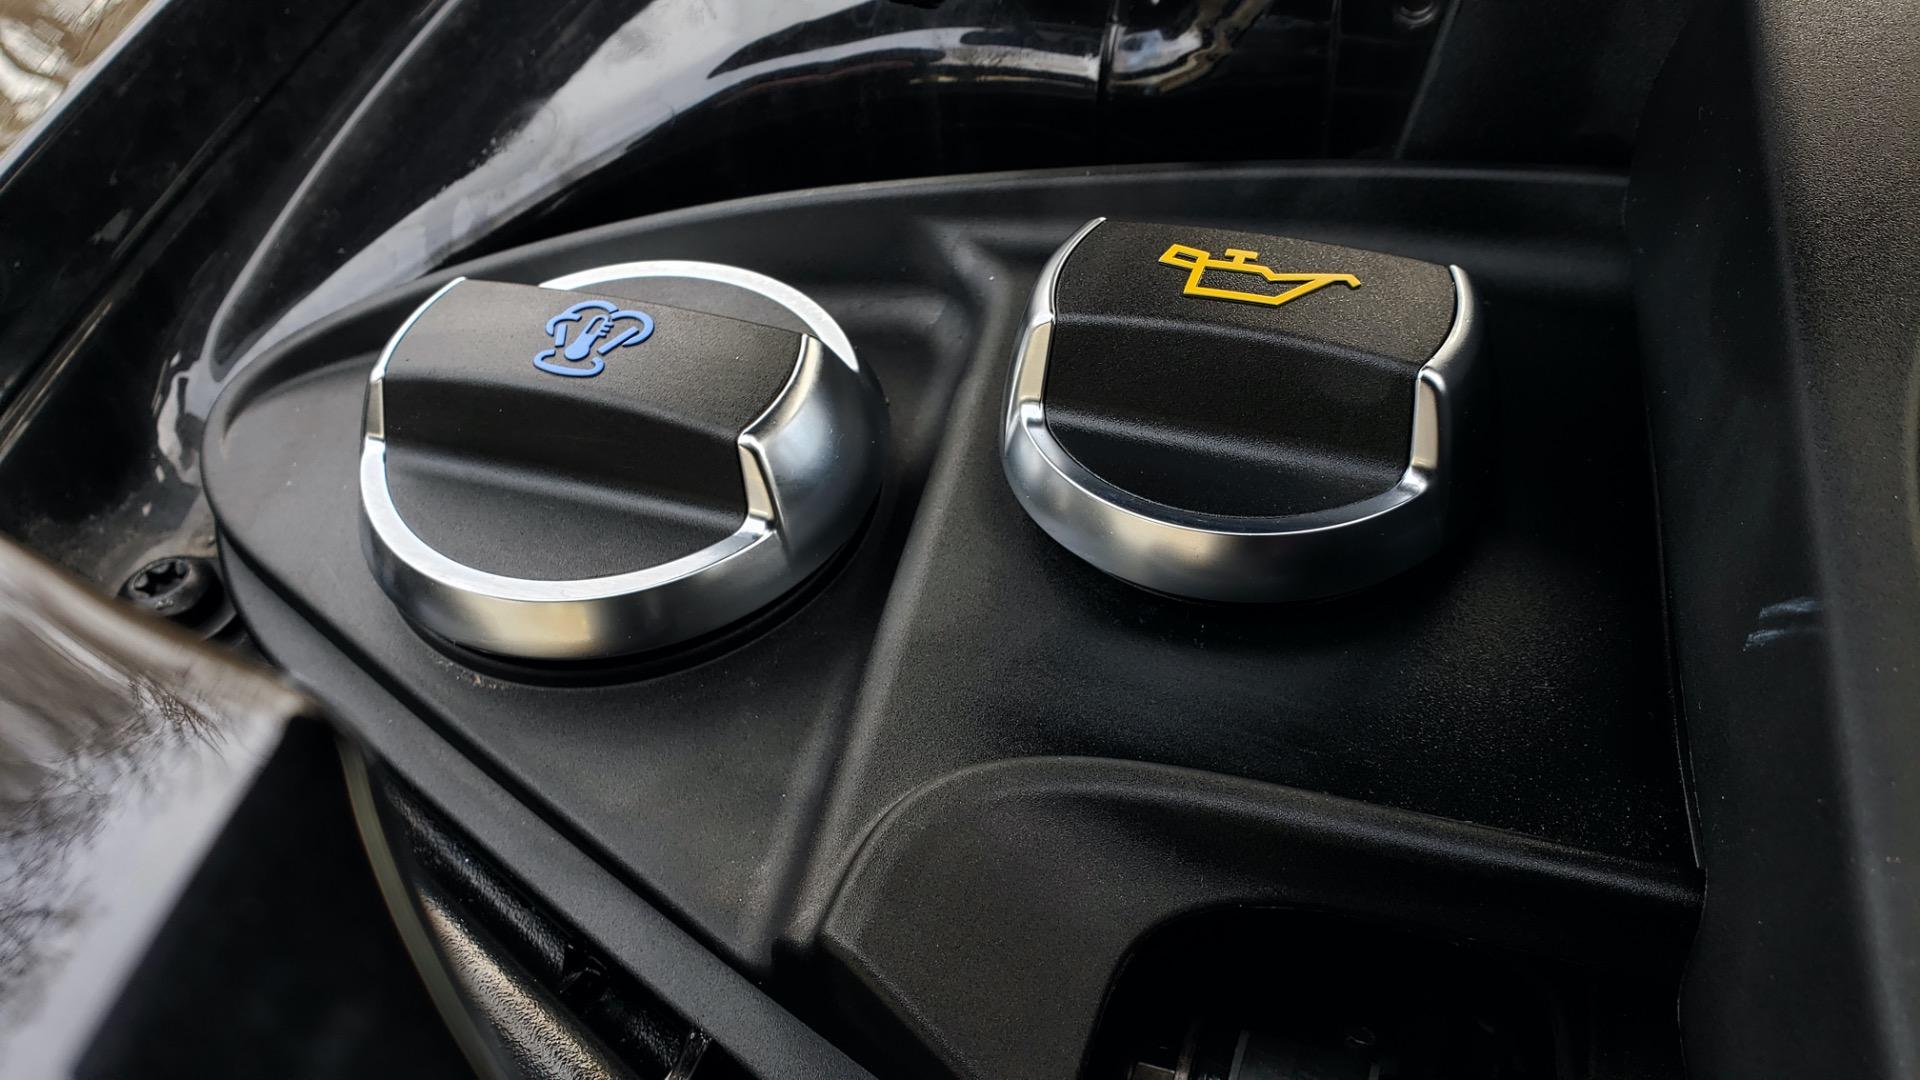 Used 2014 Porsche 911 CARRERA 4S / PREM PKG PLUS / NAV / SUNROO / BOSE / CHRONO for sale Sold at Formula Imports in Charlotte NC 28227 27